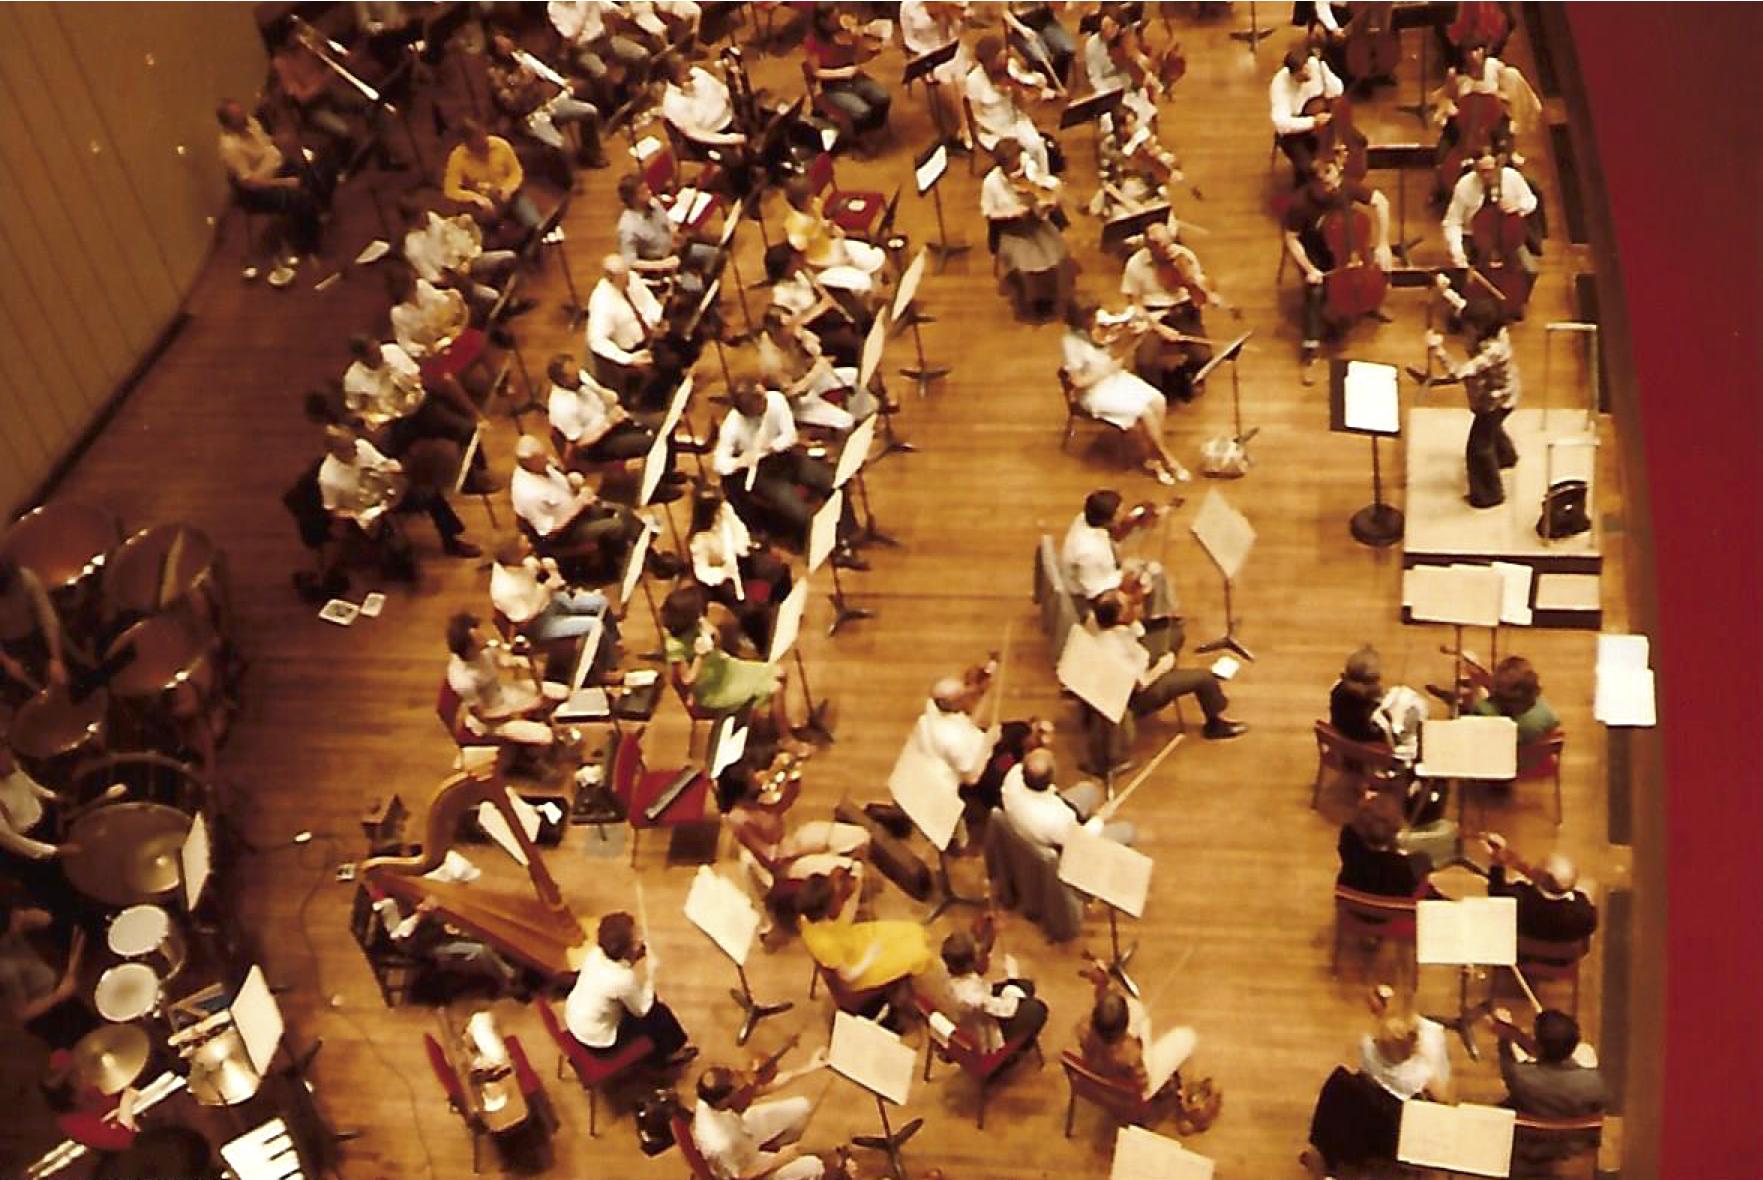 Festival Orchestra at Kennedy Center, Washington, D.C.